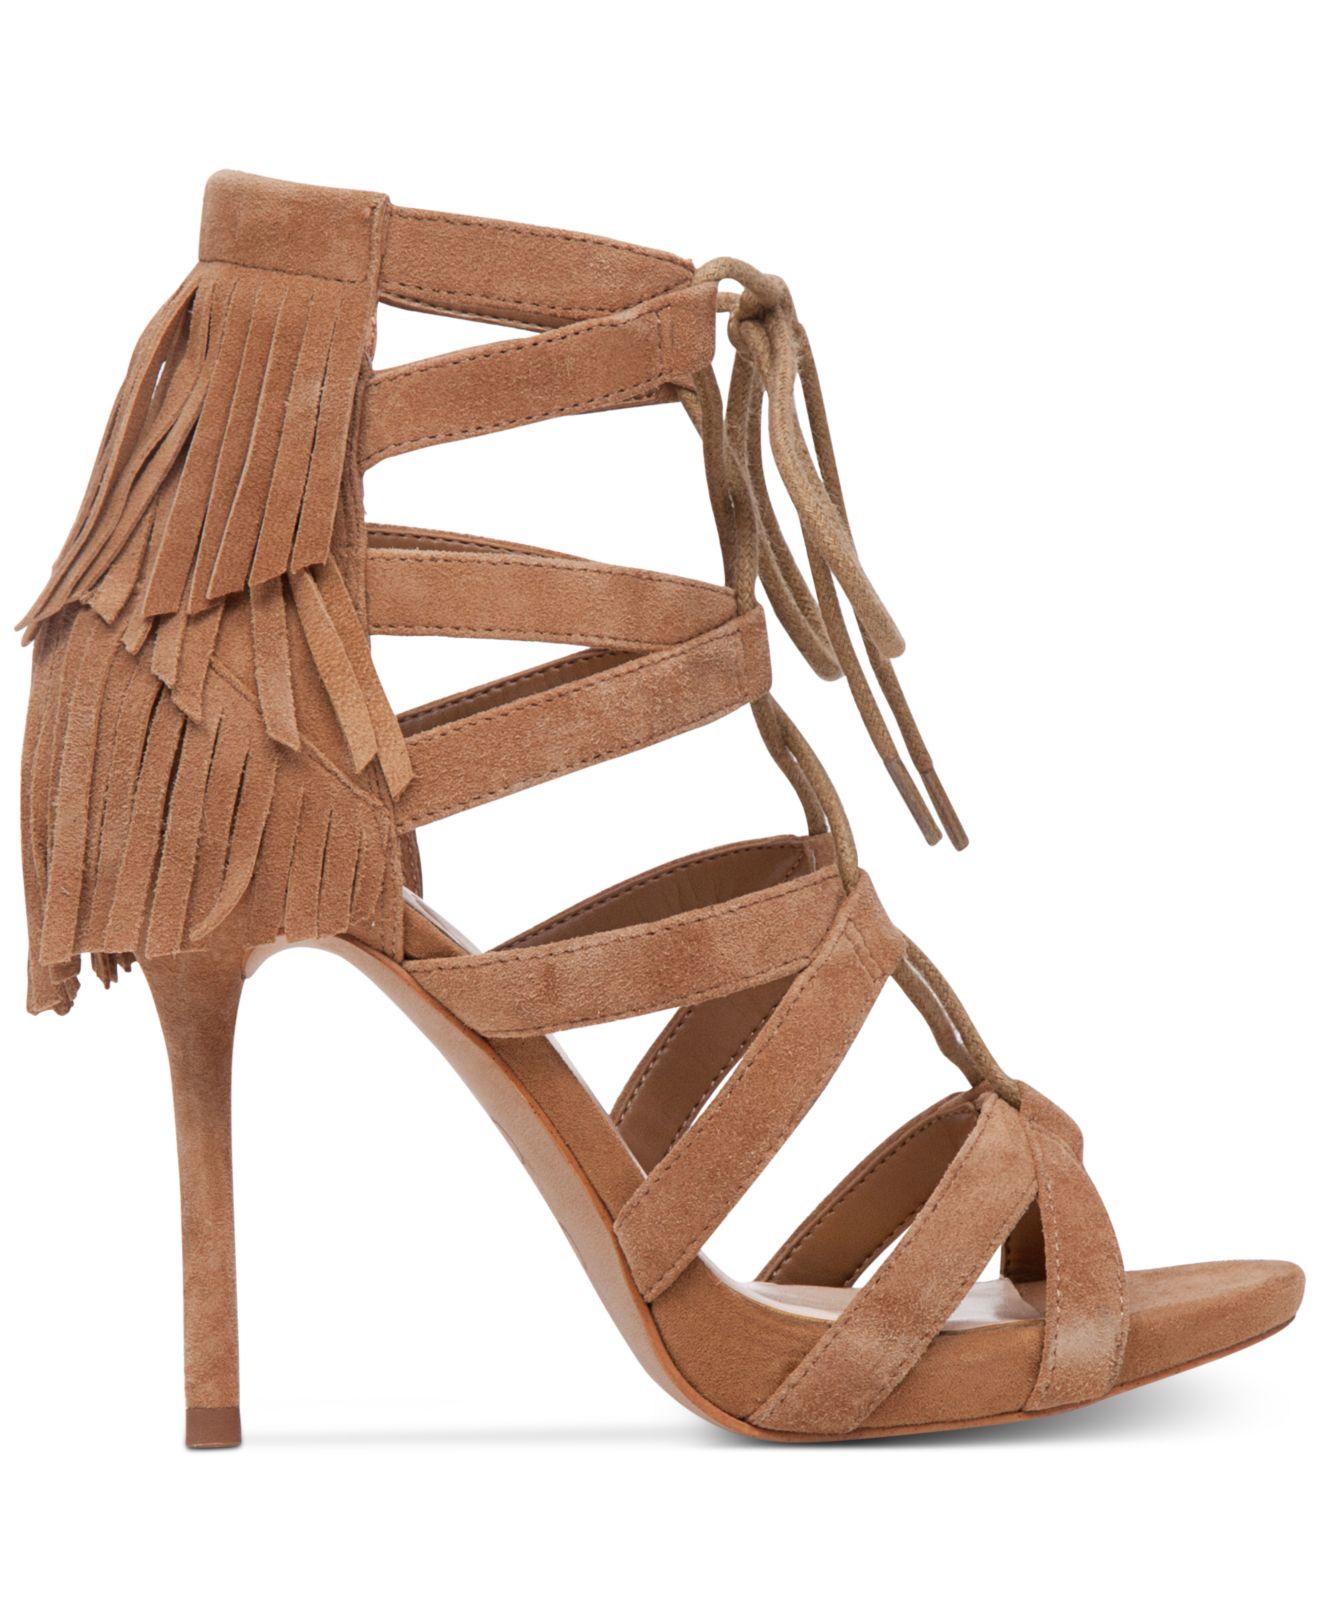 f53ab17ff53 Lyst - Jessica Simpson Bregan Fringe Lace-up Gladiator Sandals in ...